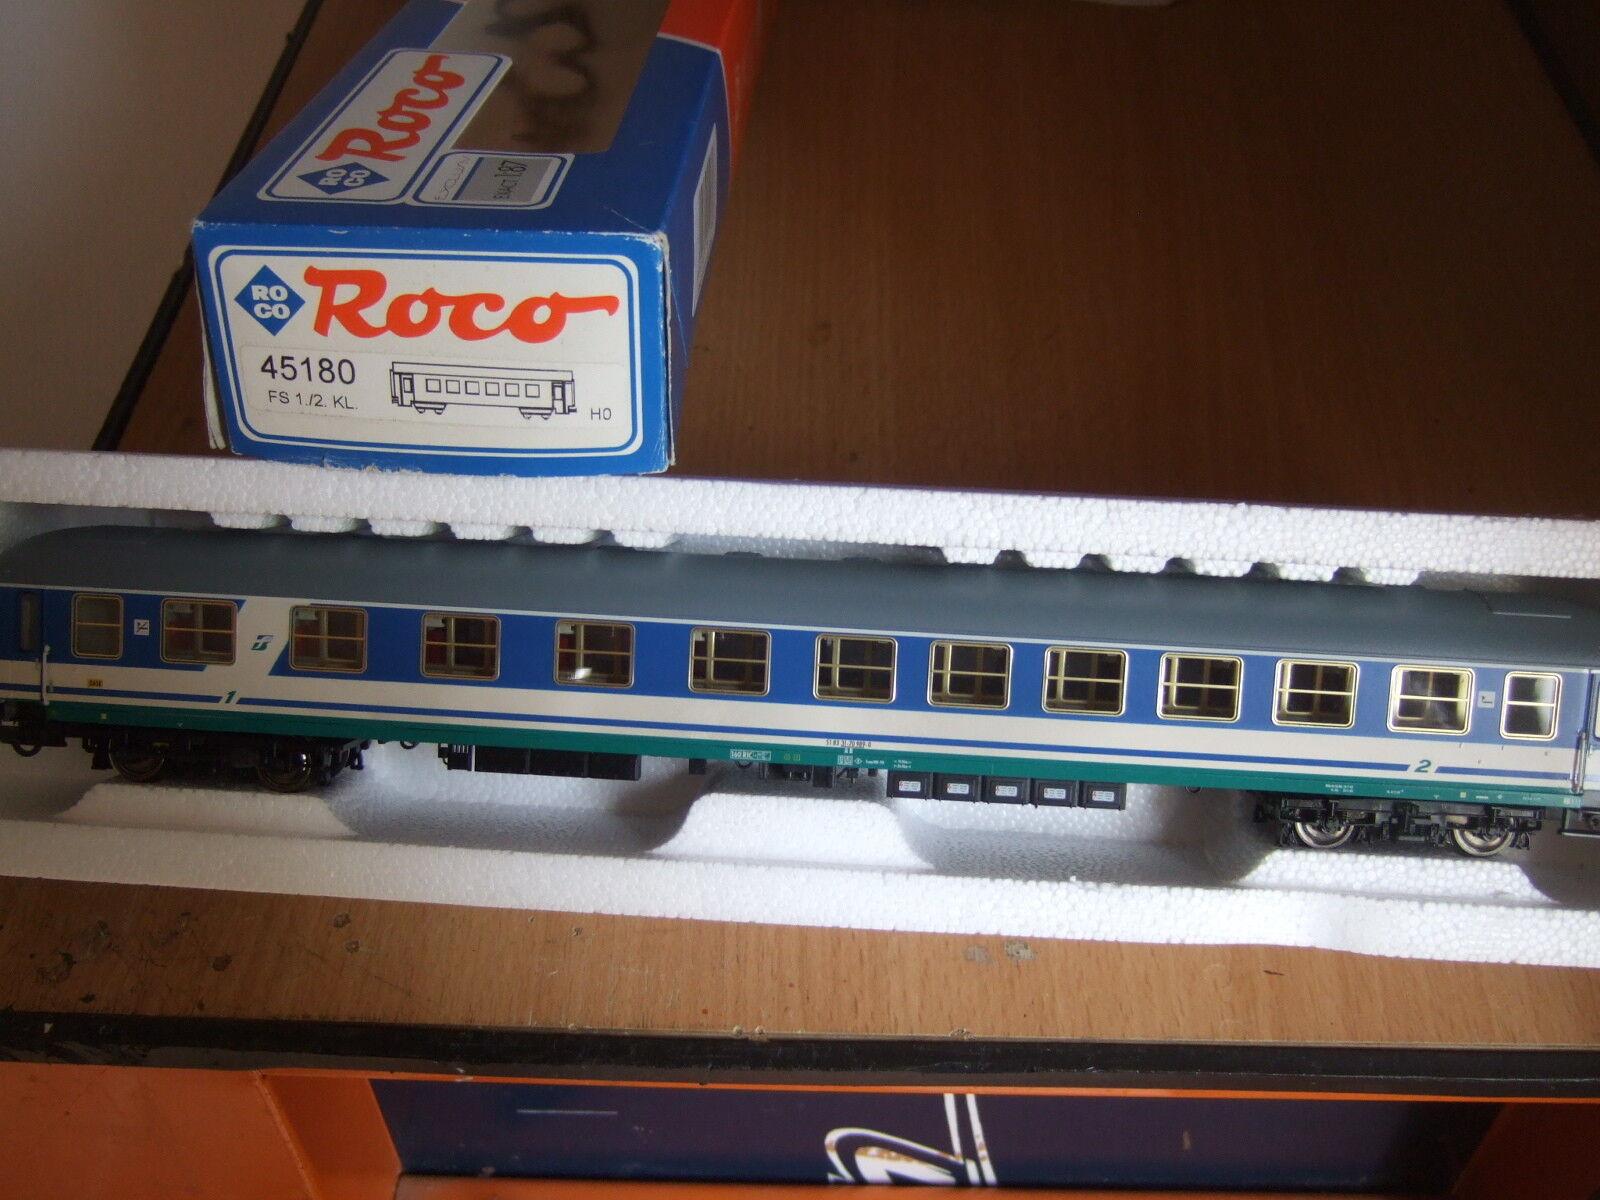 ROCO 45180 CARROZZA FS 1  2 CLASSE SCALA HO 1 87